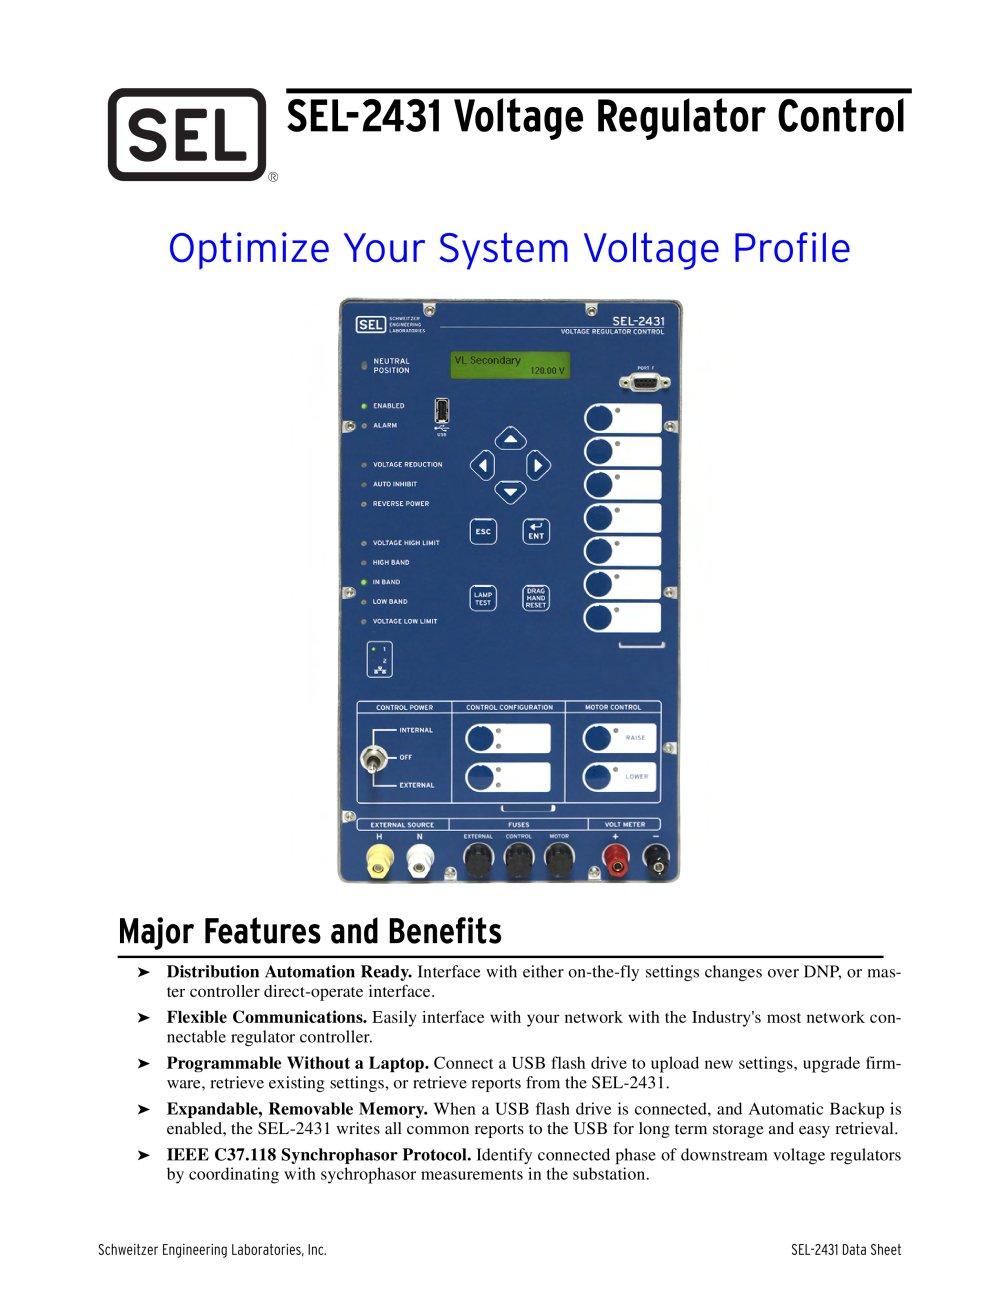 sel 2431 voltage regulator control 603719_1b sel 2431 voltage regulator control schweitzer engineering sel 451 wiring diagram at webbmarketing.co